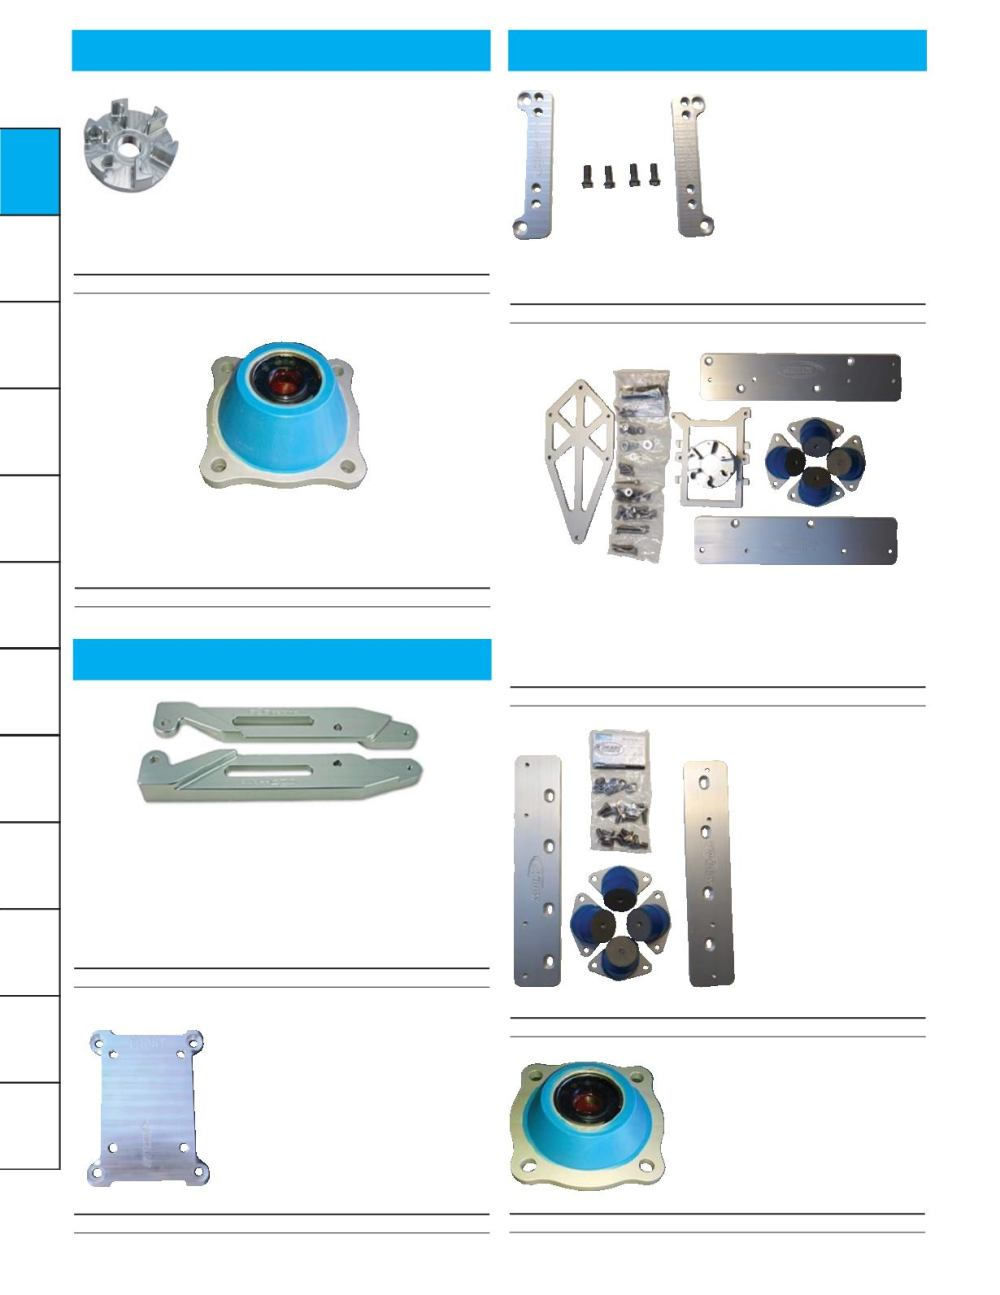 medium resolution of get free high quality hd wallpapers cuyuna engine wiring diagram